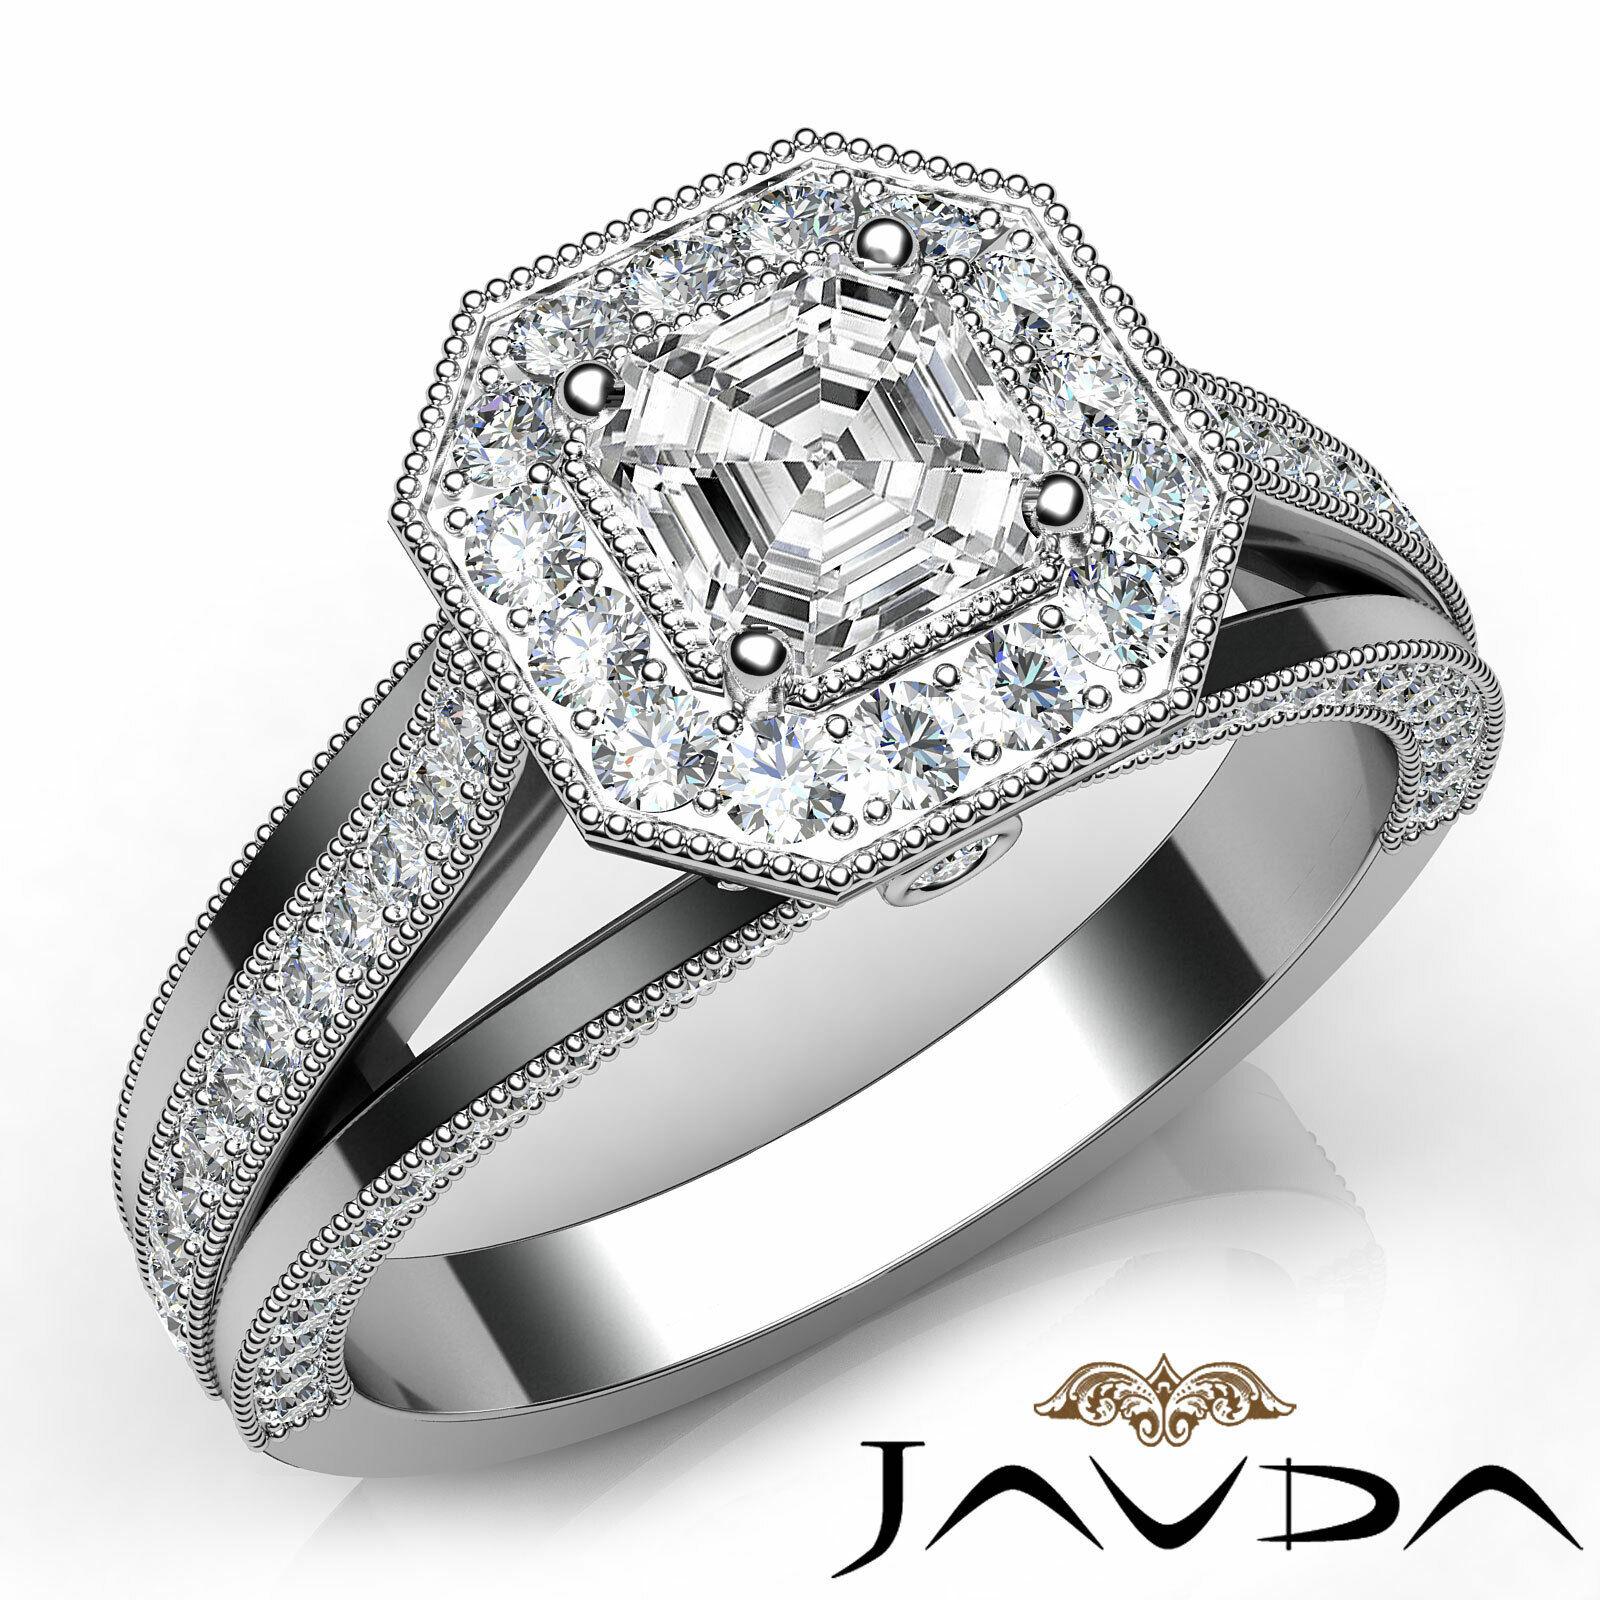 Trio Shank Milgrain Bezel Set Asscher Diamond Engagement Ring GIA H VS2 1.62 Ct